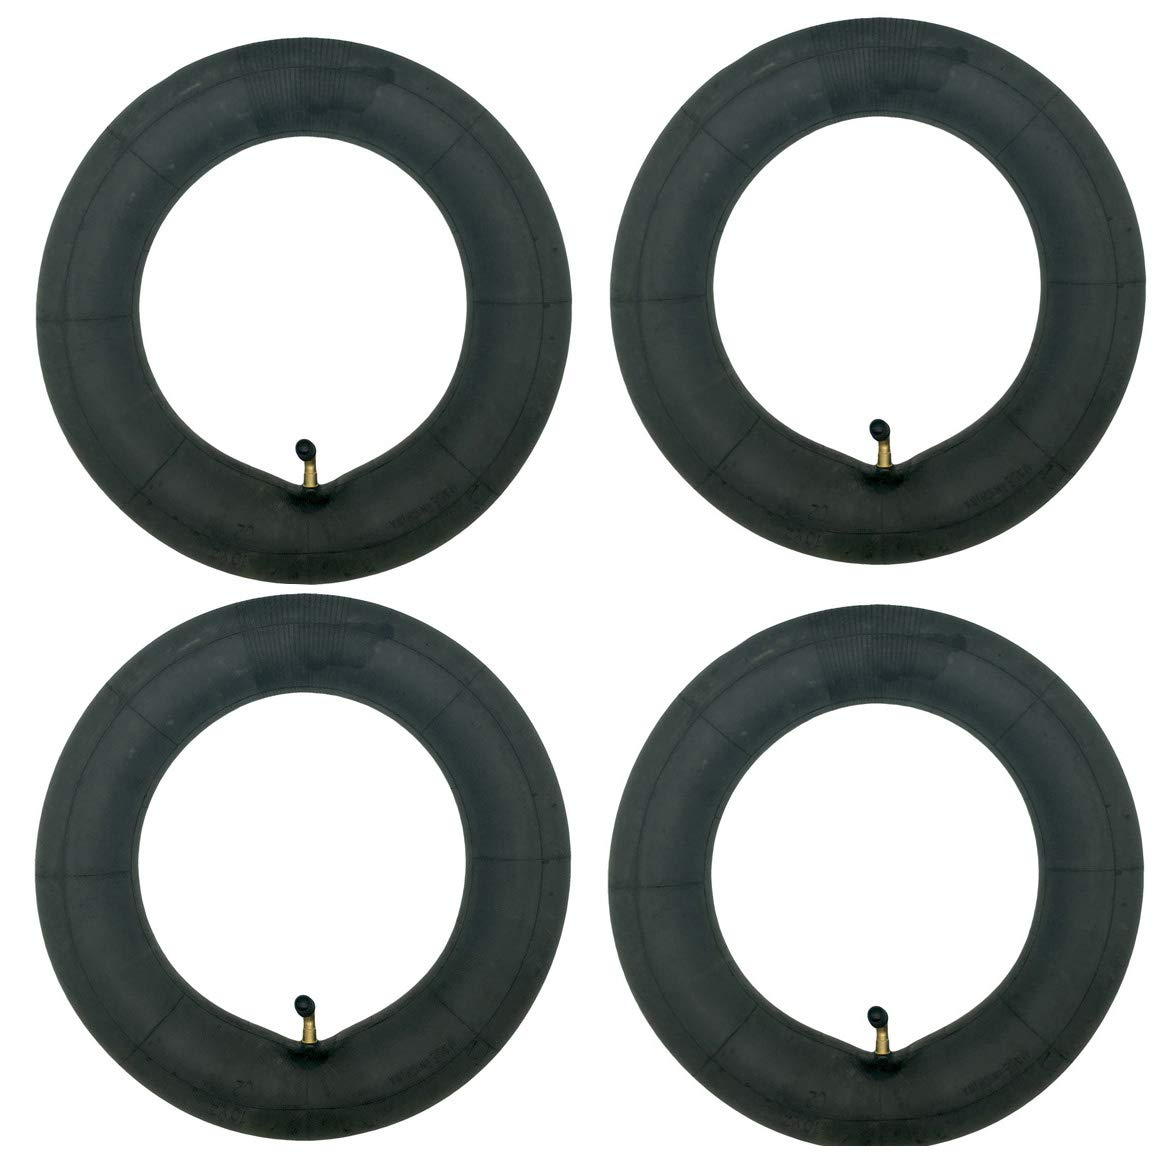 YYINGG Inner Tube Better Resistant to aging High temperature resistance Innertube With Bent Valve for 10 Tire 10x1.95 10x2.125 10x2.2 10x2.25 Inner Tube 1 Pack